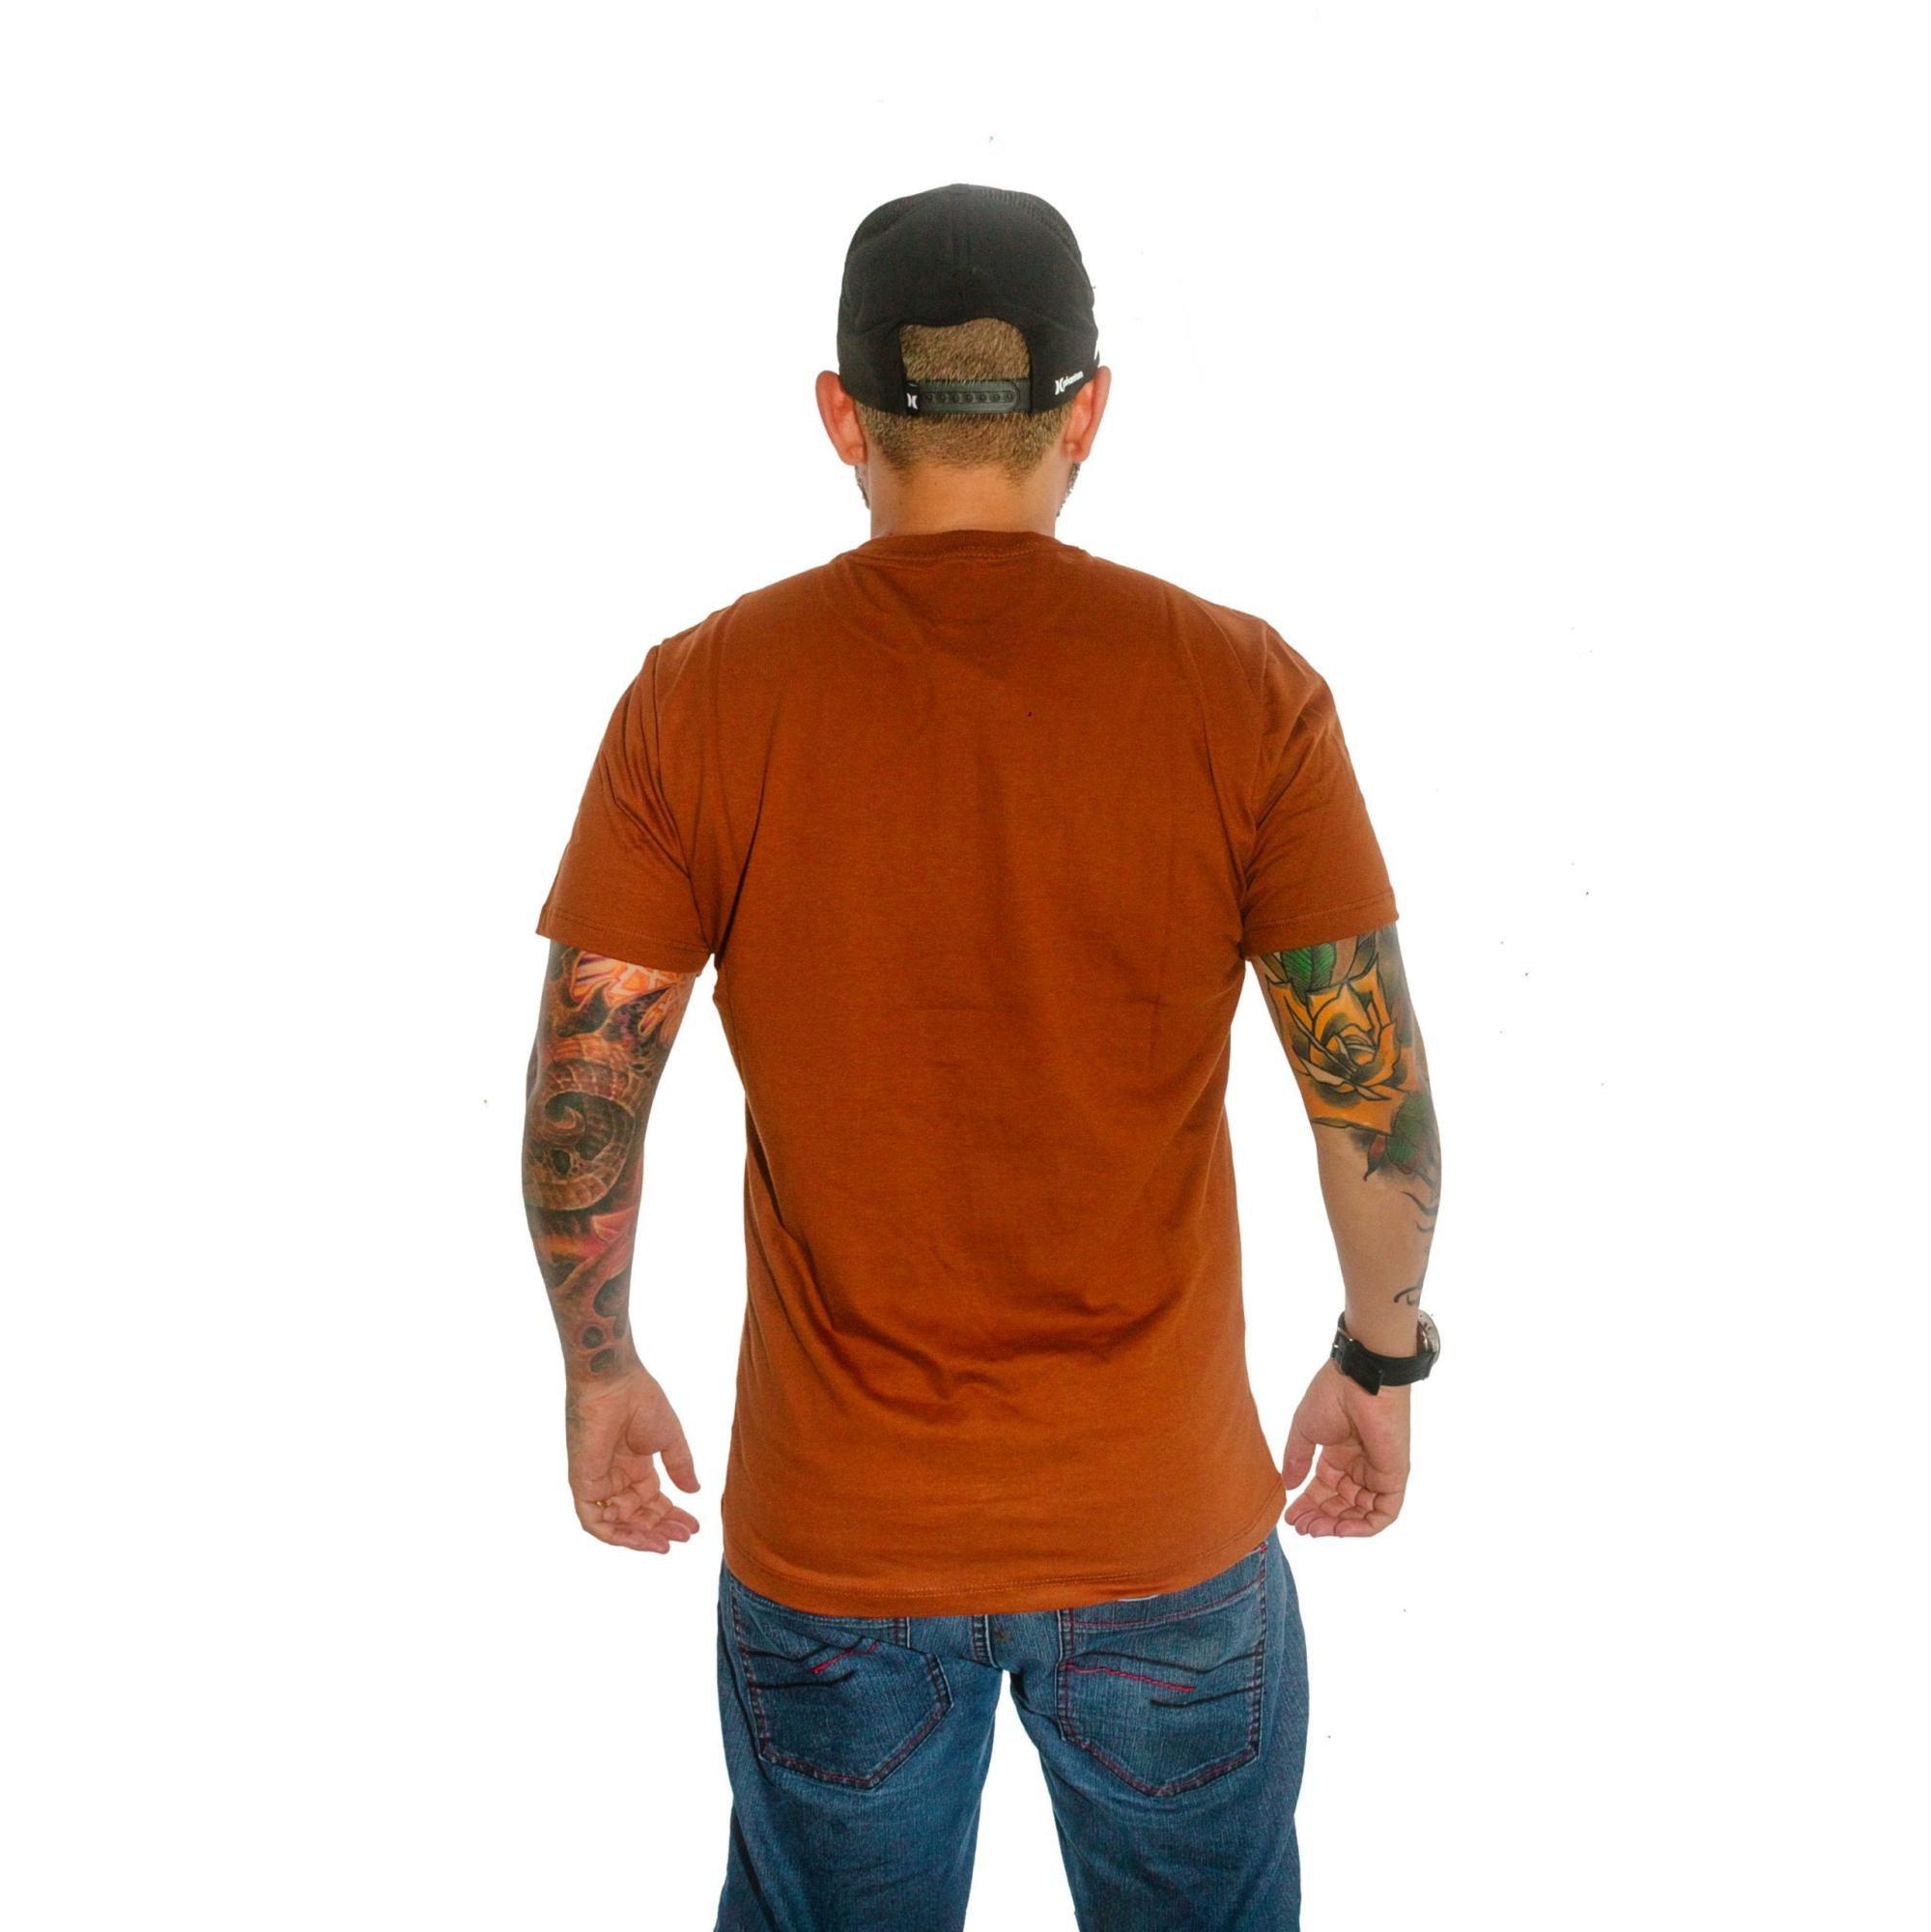 Camiseta Hurley Marrom Mescla